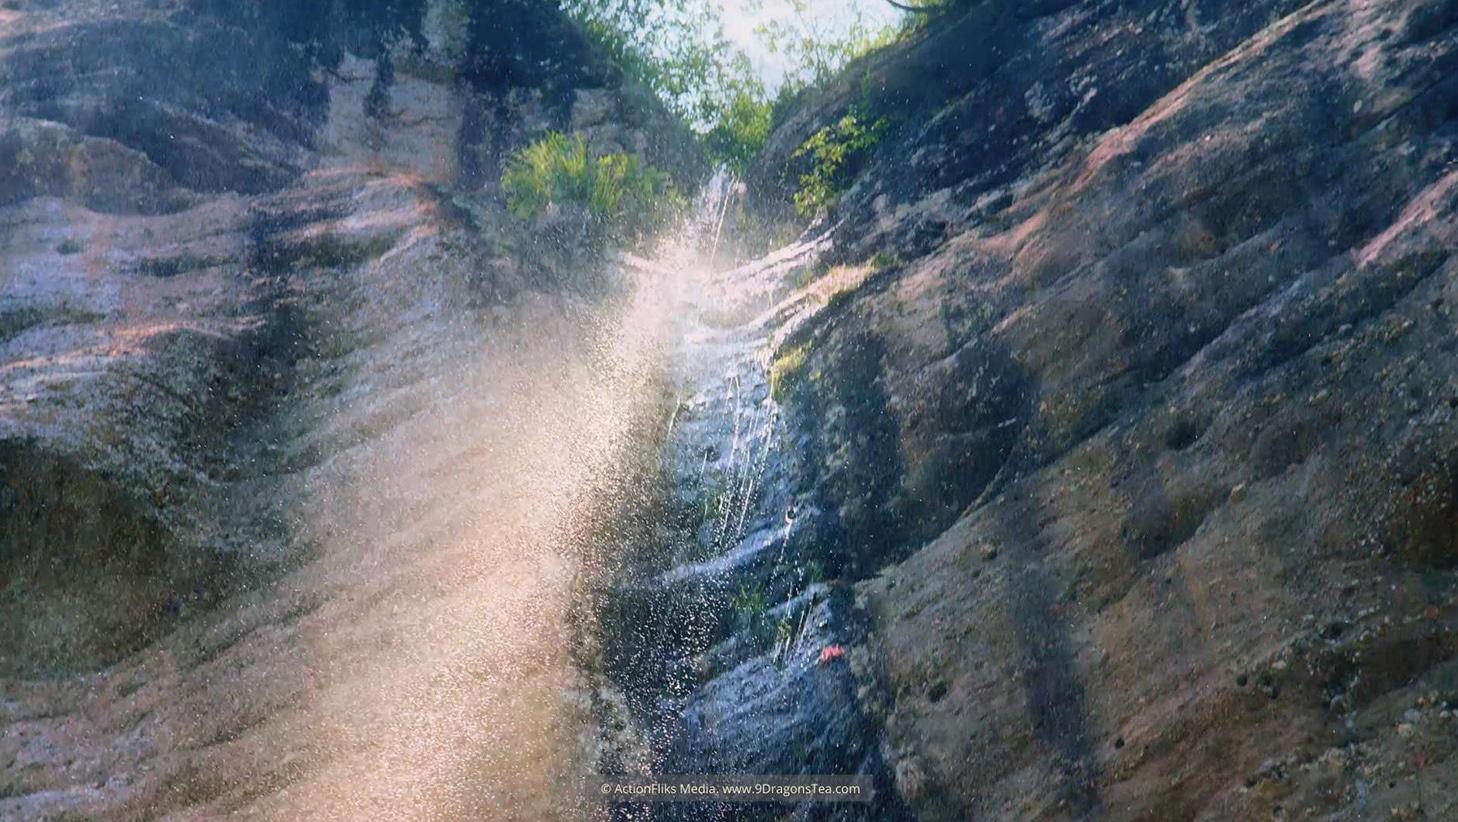 Wuyishan landscape waterfall dragon pond cave tall mountain upshot